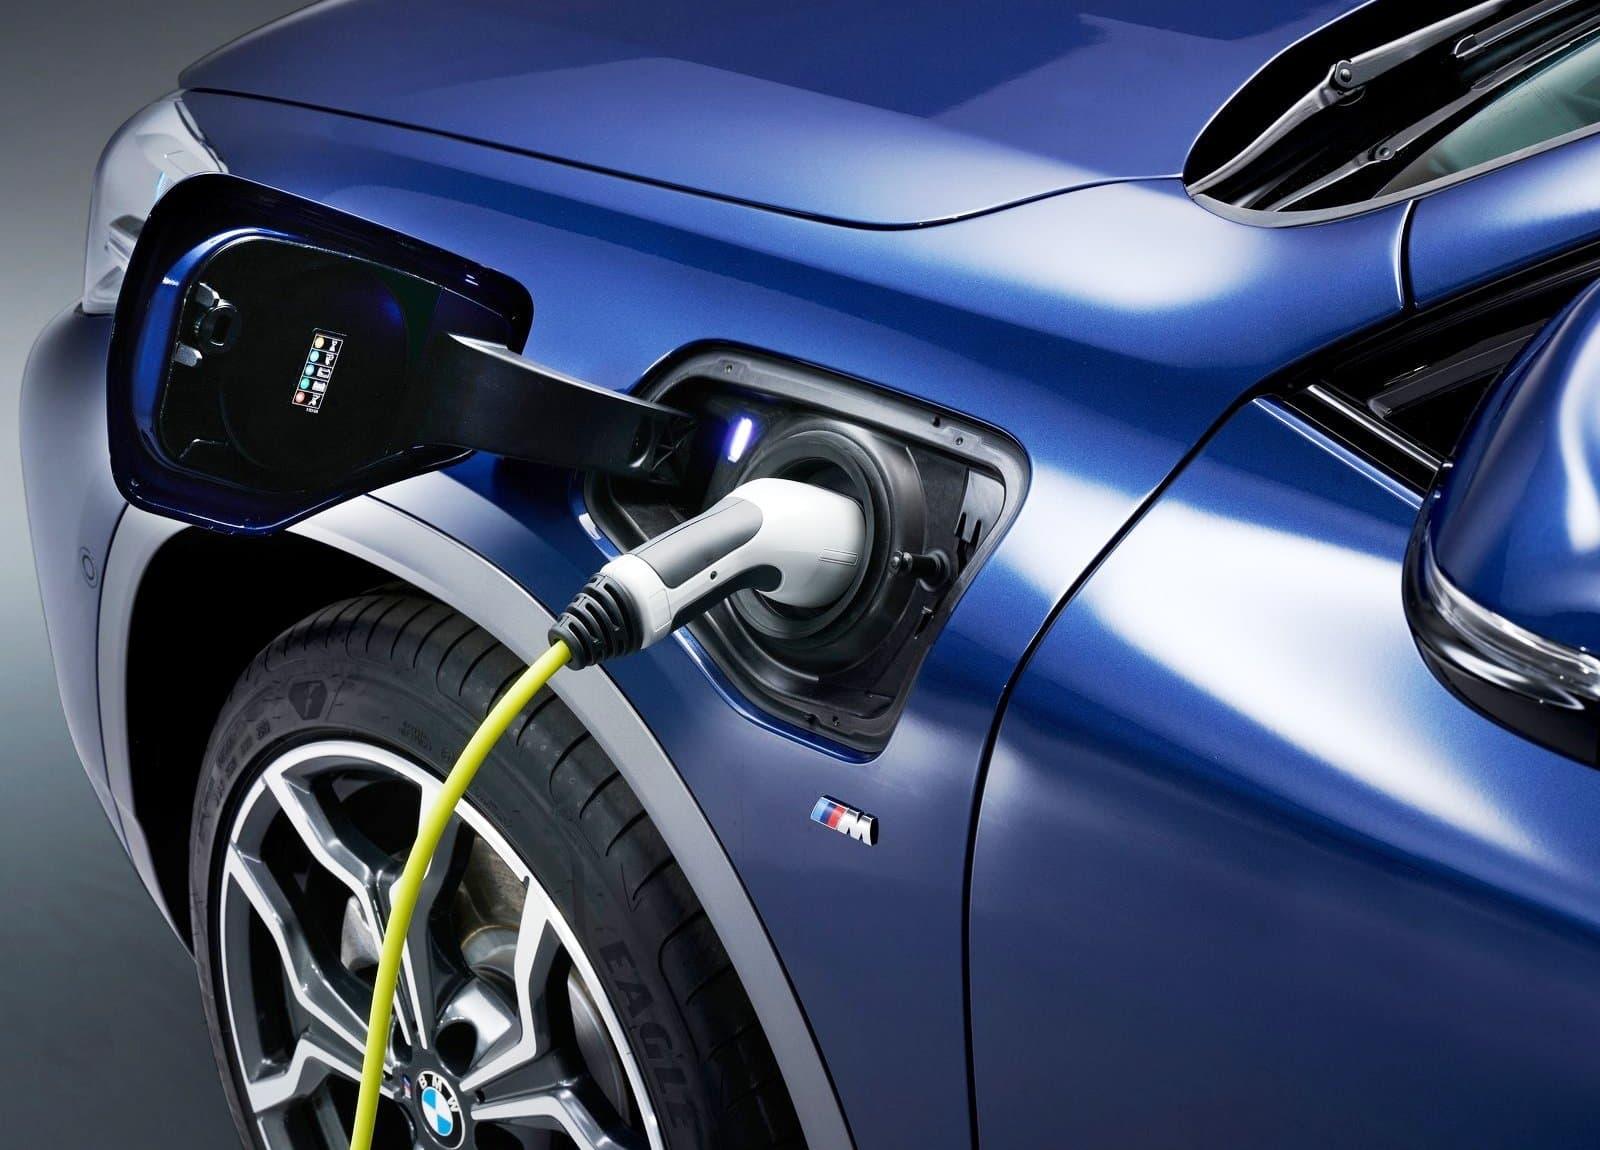 BMW X2 xDrive25e charging port (1)